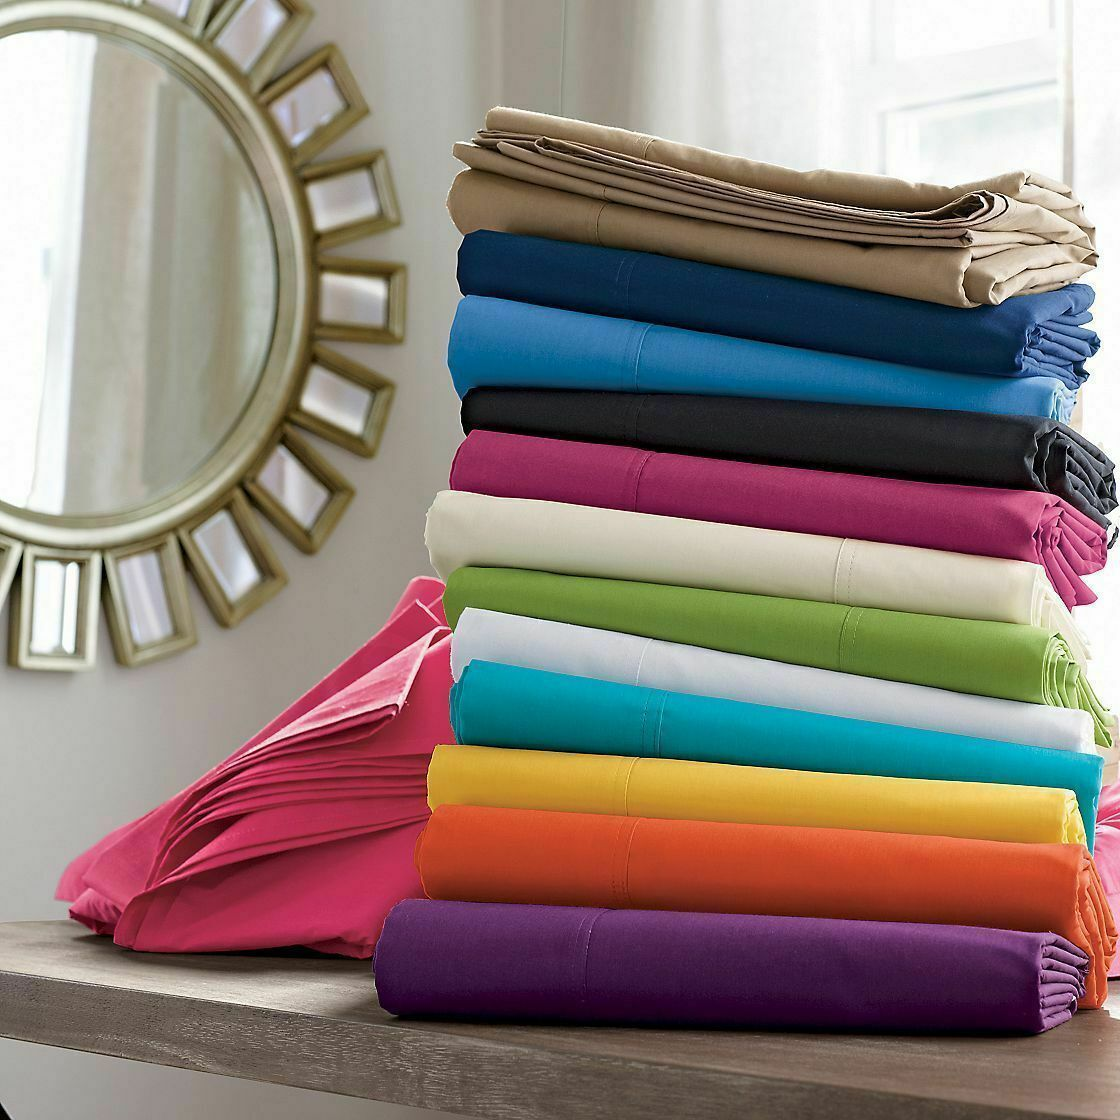 Bed Sheet Set USA Size Multi colors 100% Cotton 400-TC 15 Inch drop 4 Qty